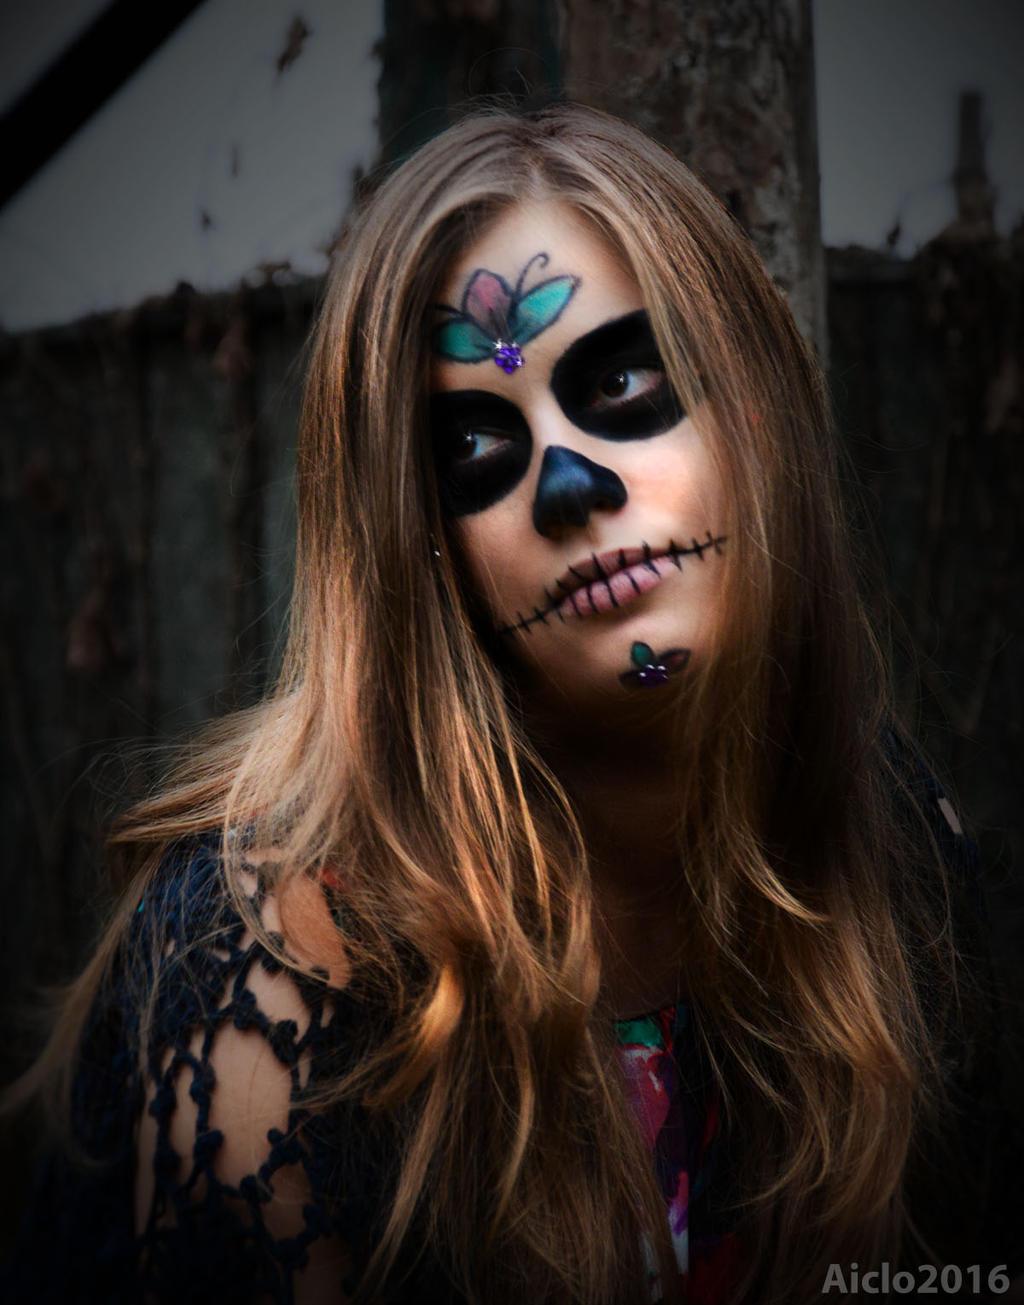 Dark Madonna by Aiclo